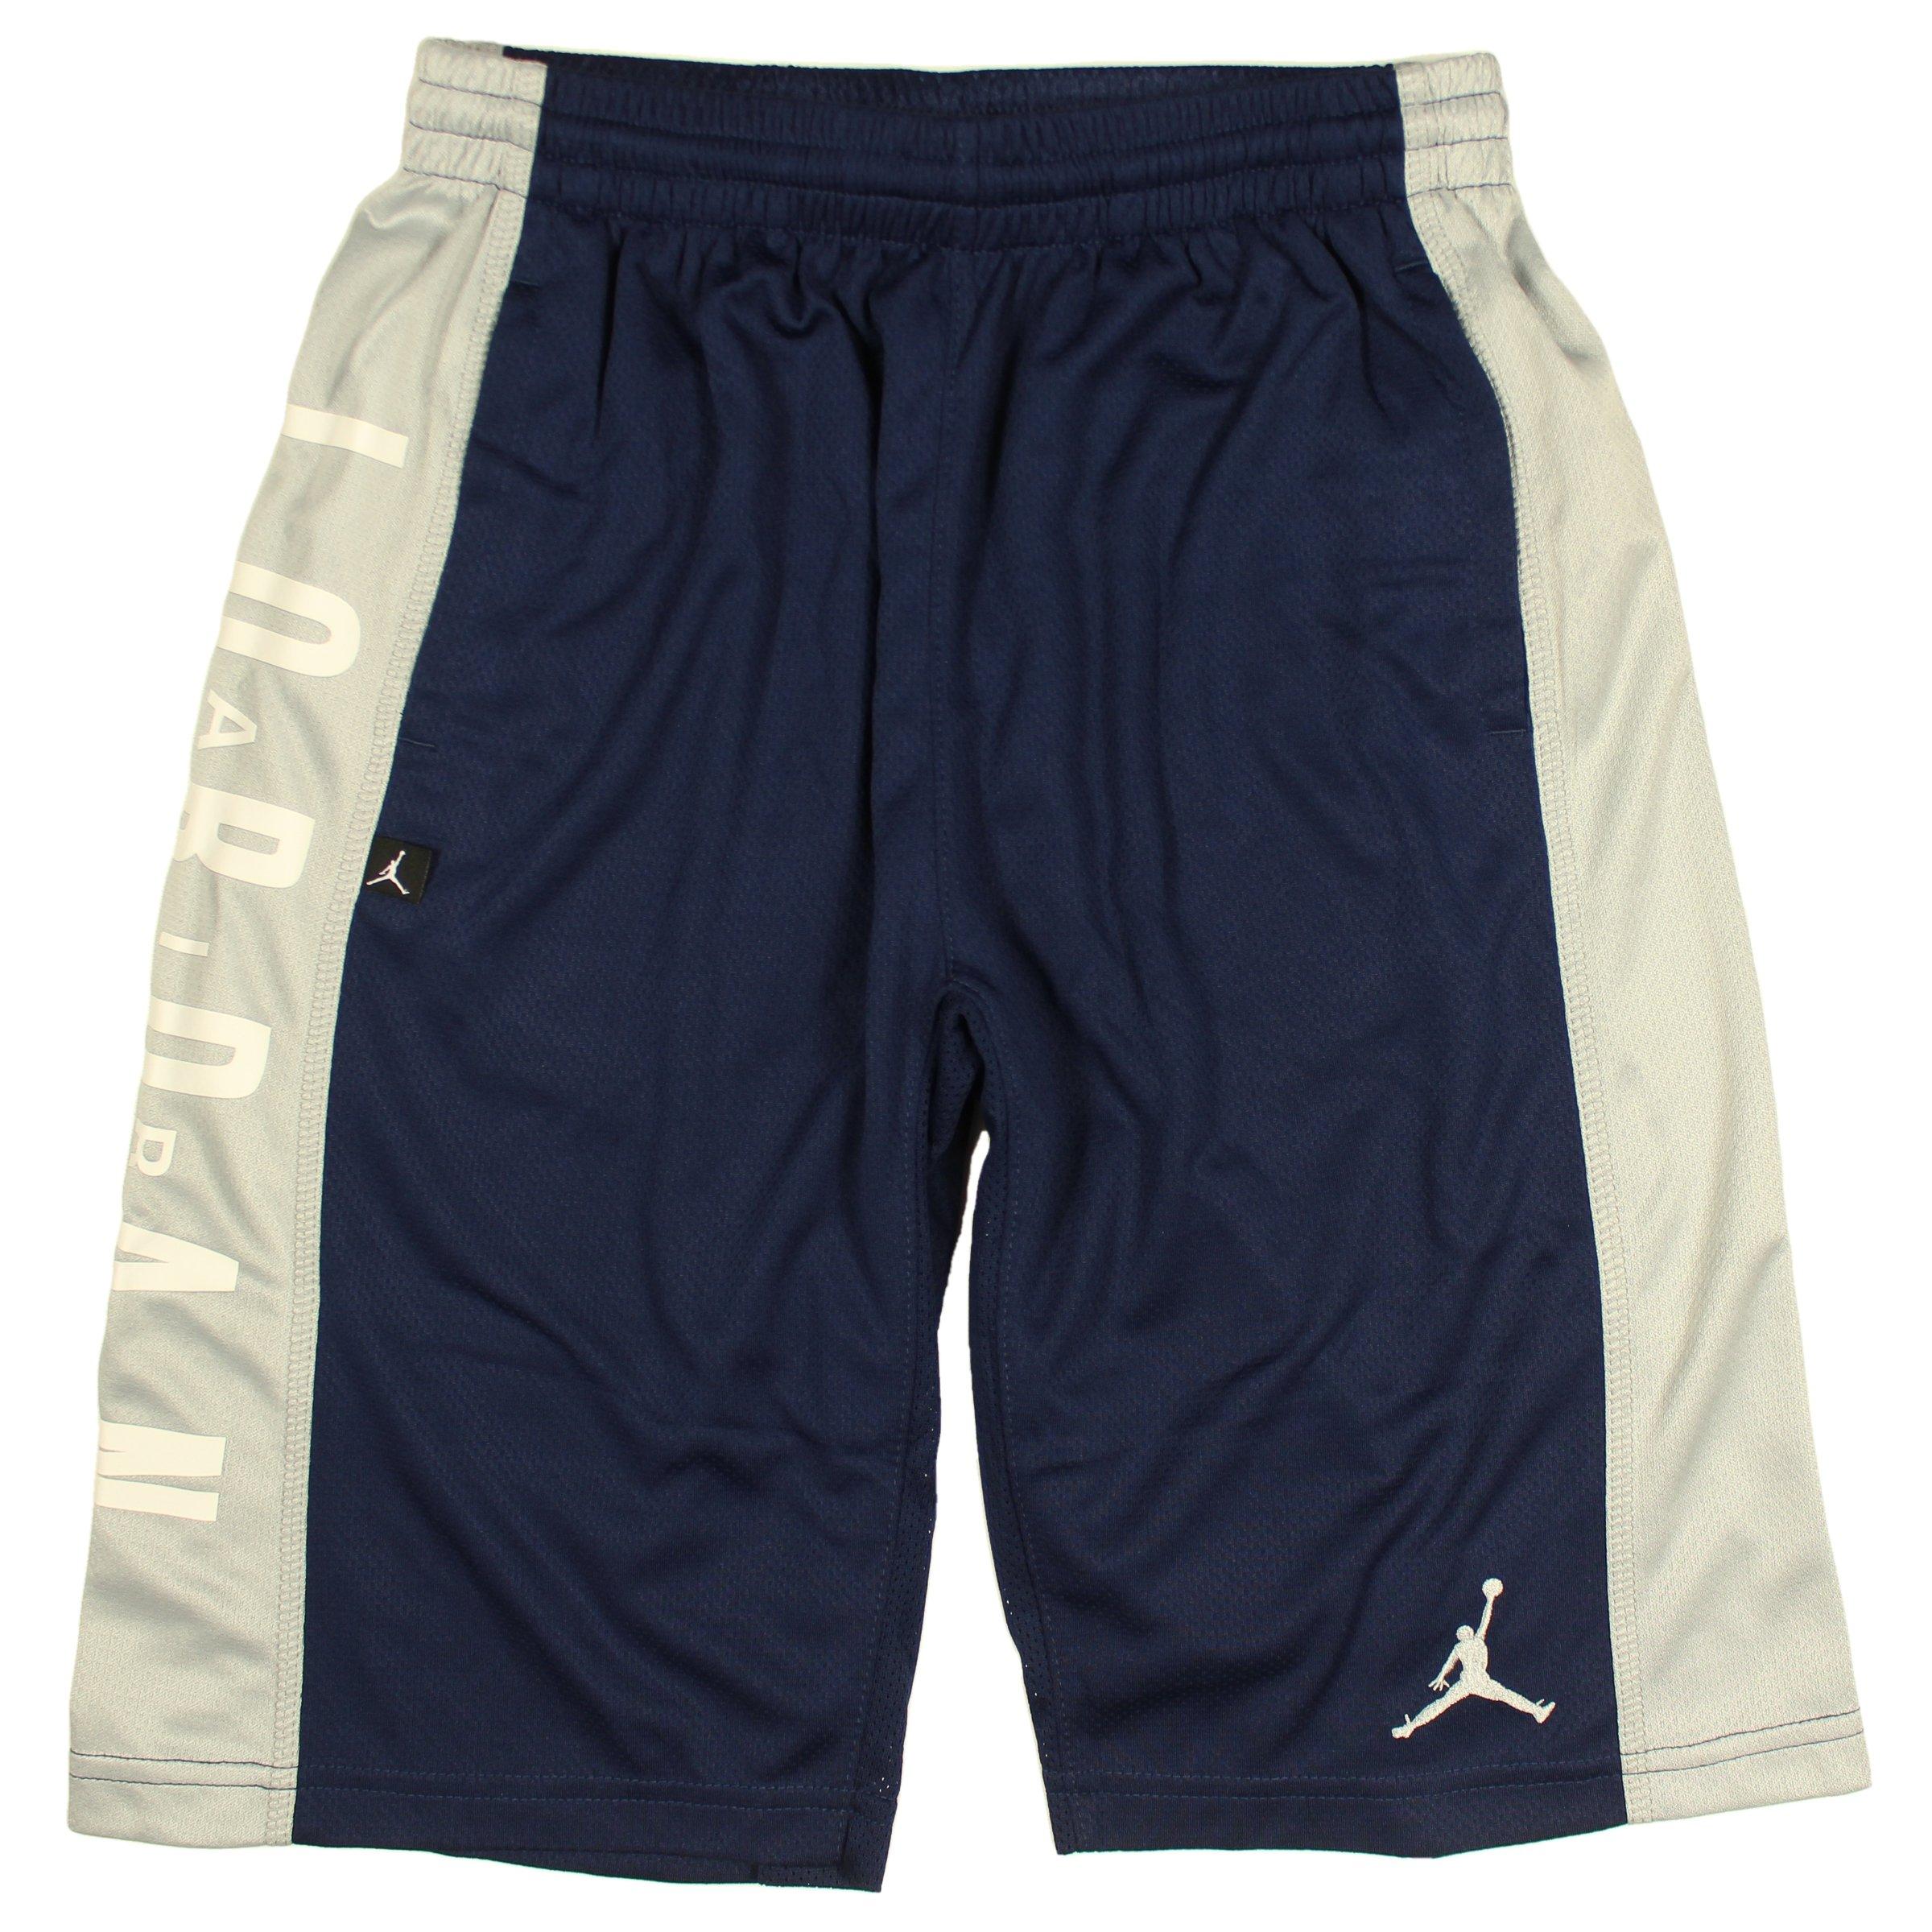 Jordan Nike Air Boy's Highlight Dri-Fit Athletic Mesh Basketball Shorts (Small (8-10 yrs.), Midnight Navy)